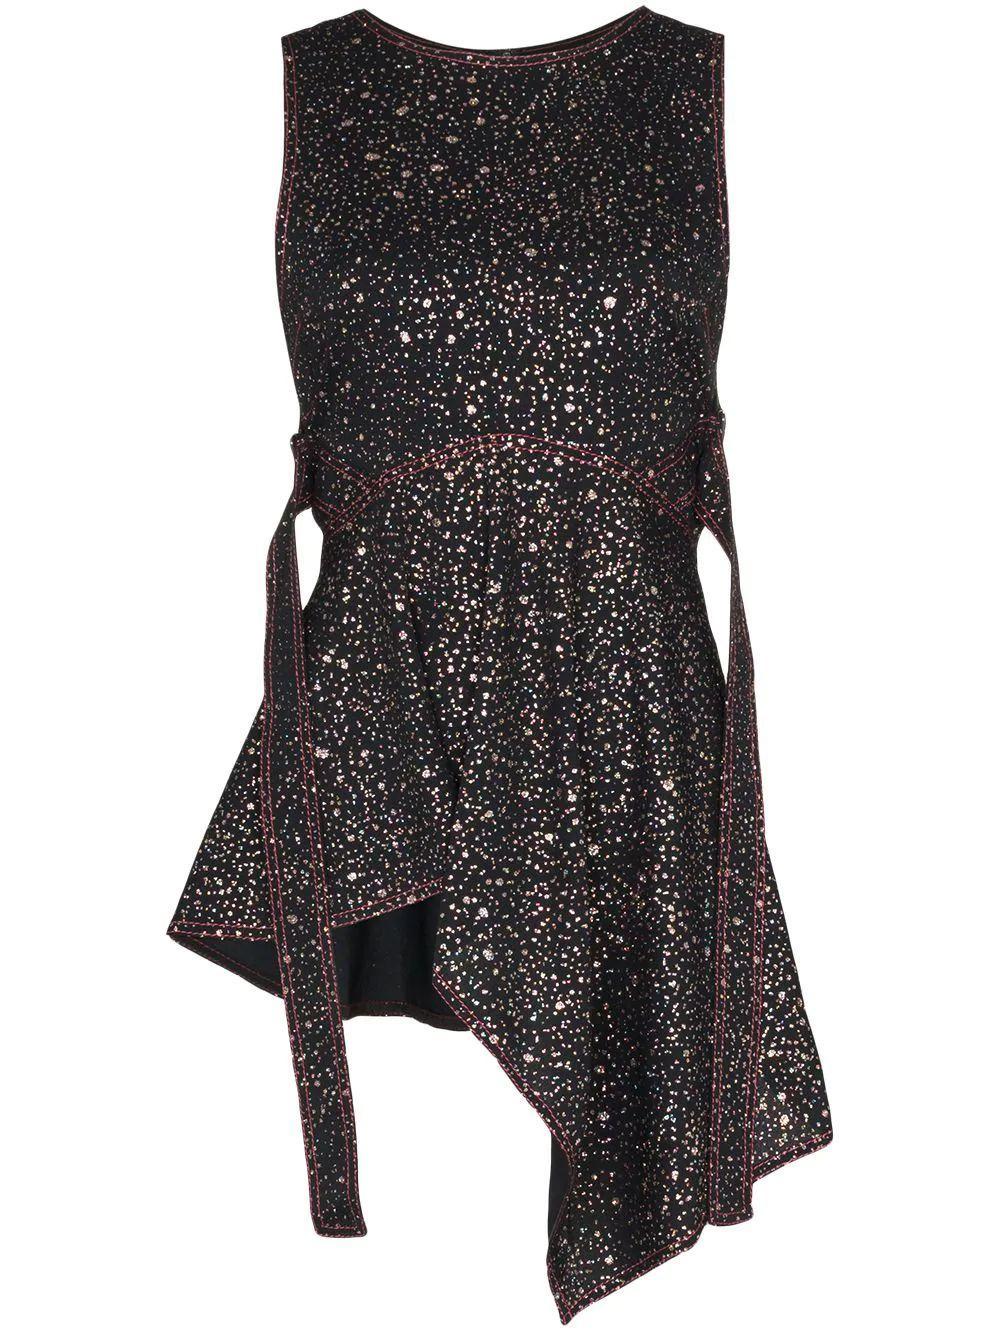 Genevieve Glitter Marocaine Sleeveless Top Item # 13MG3081-59820